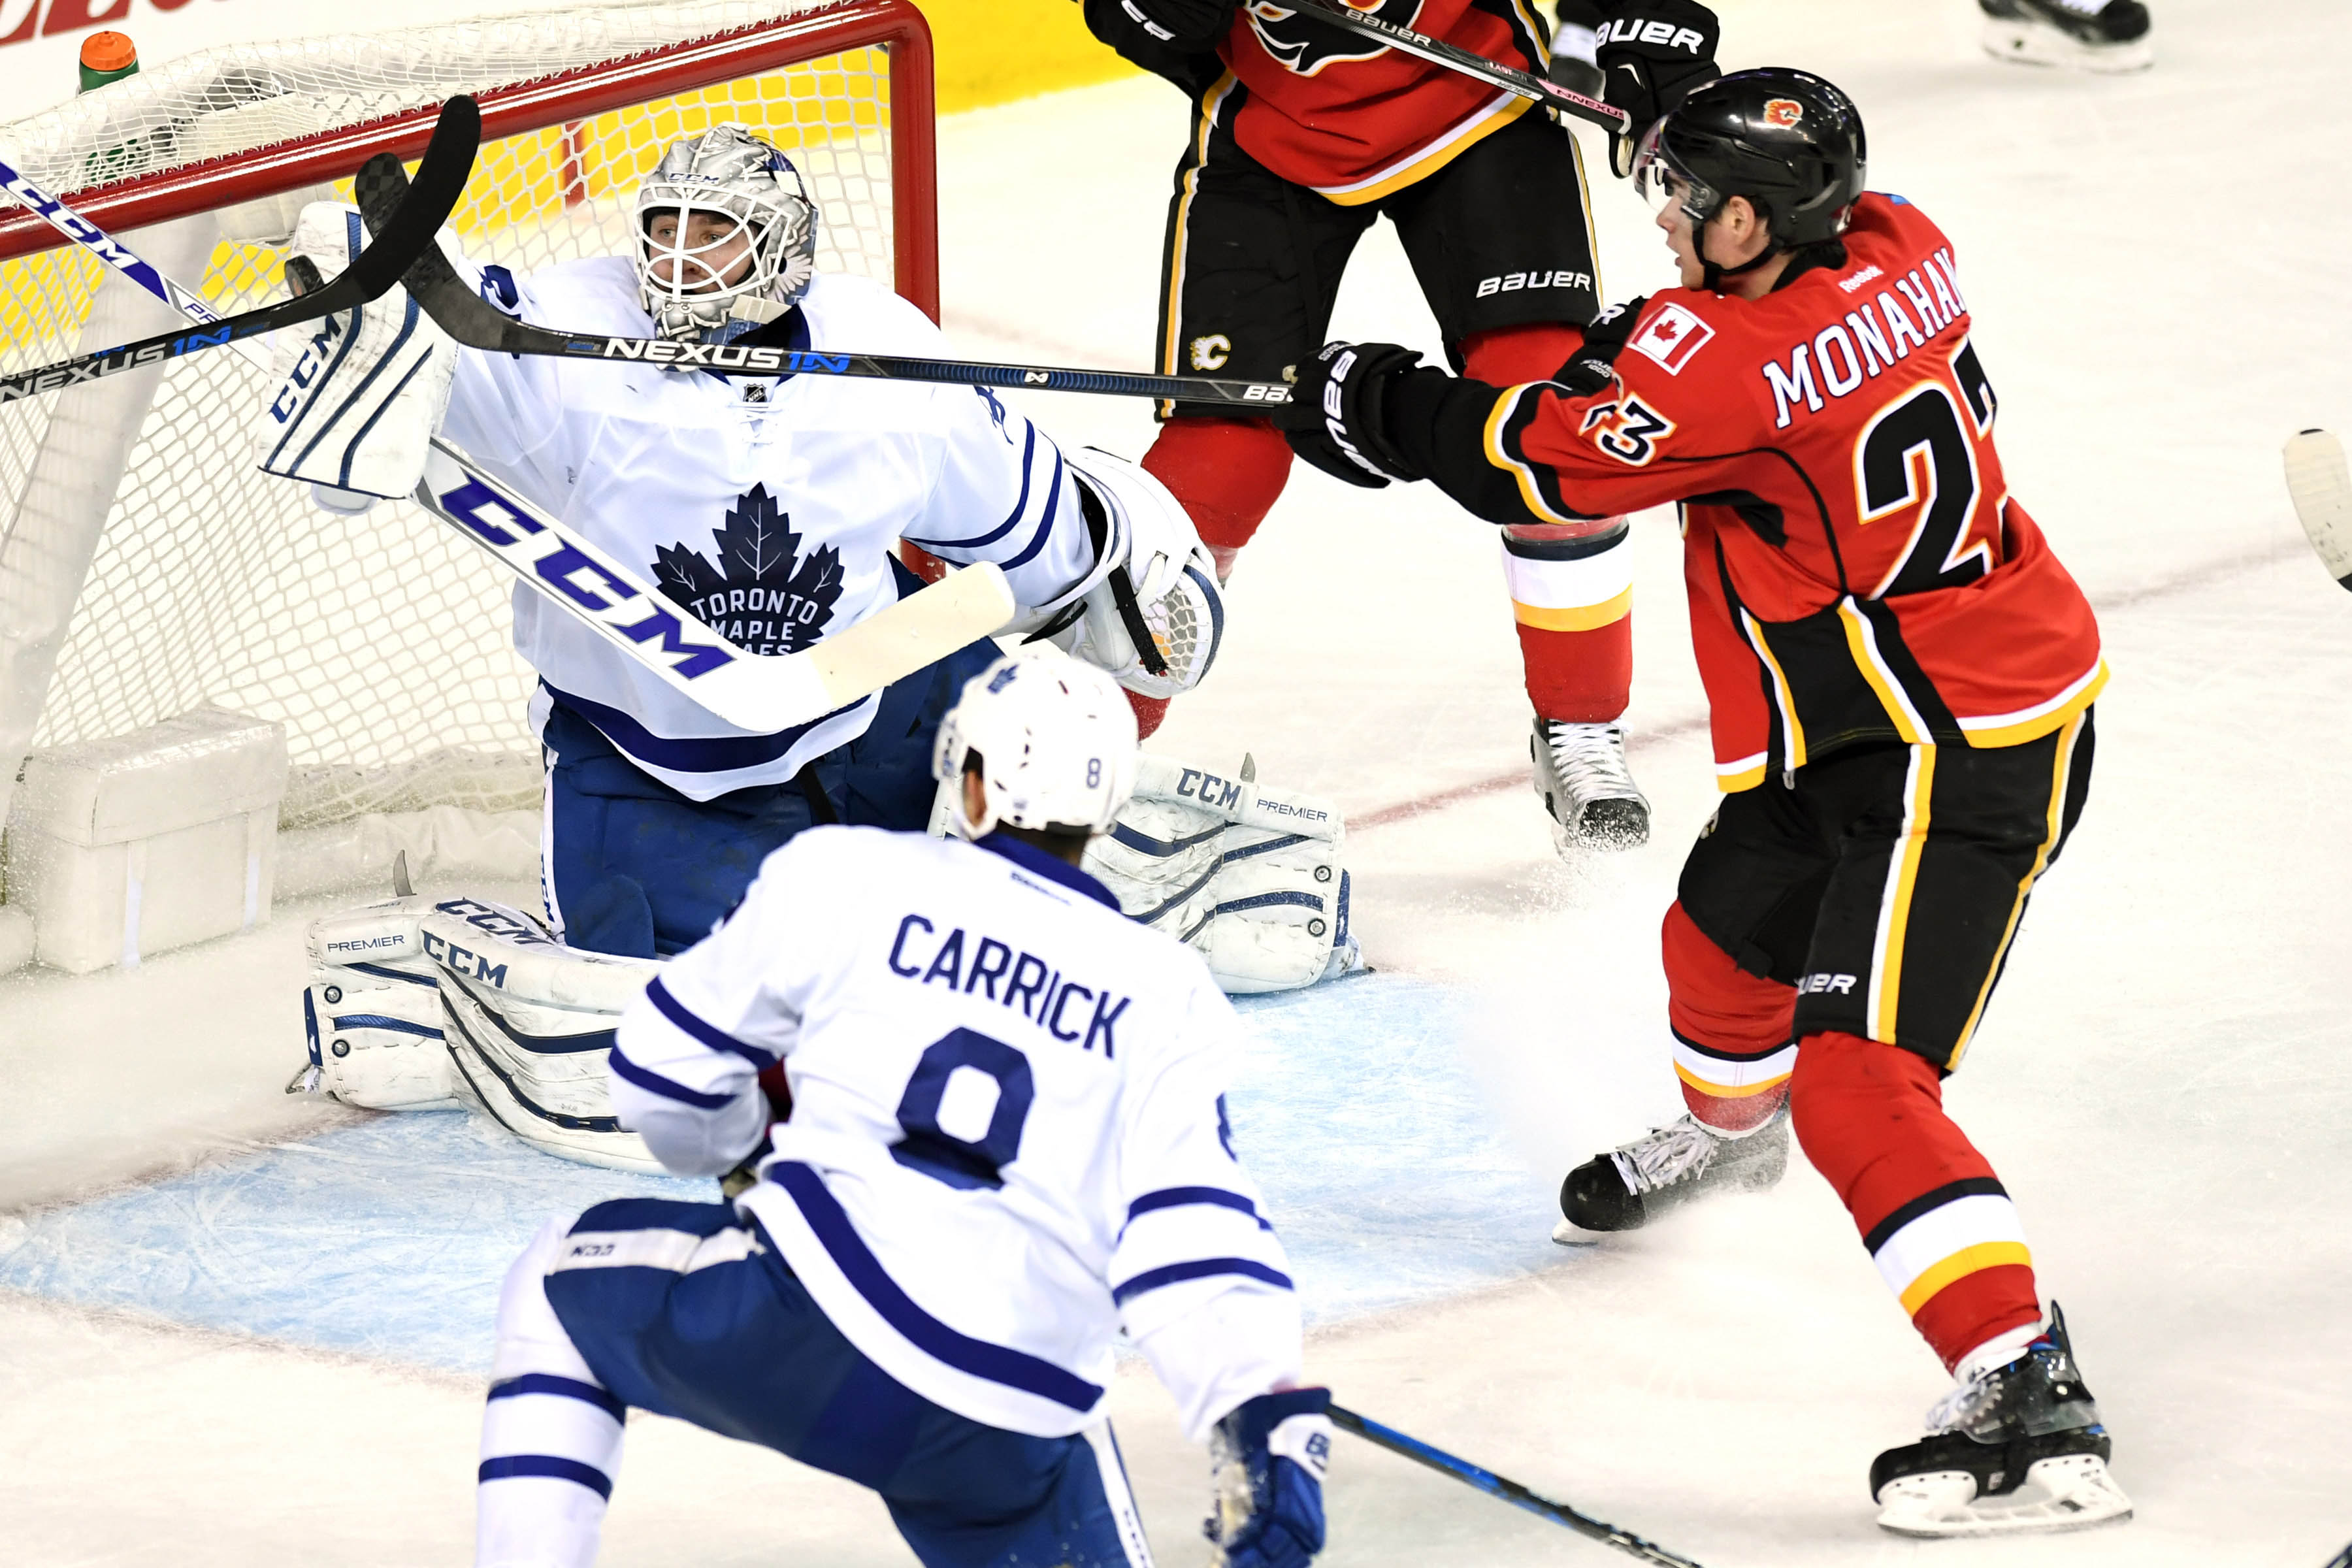 Calgary Flames Daily: Facing the Leafs, Matthew Tkachuk Proving Himself